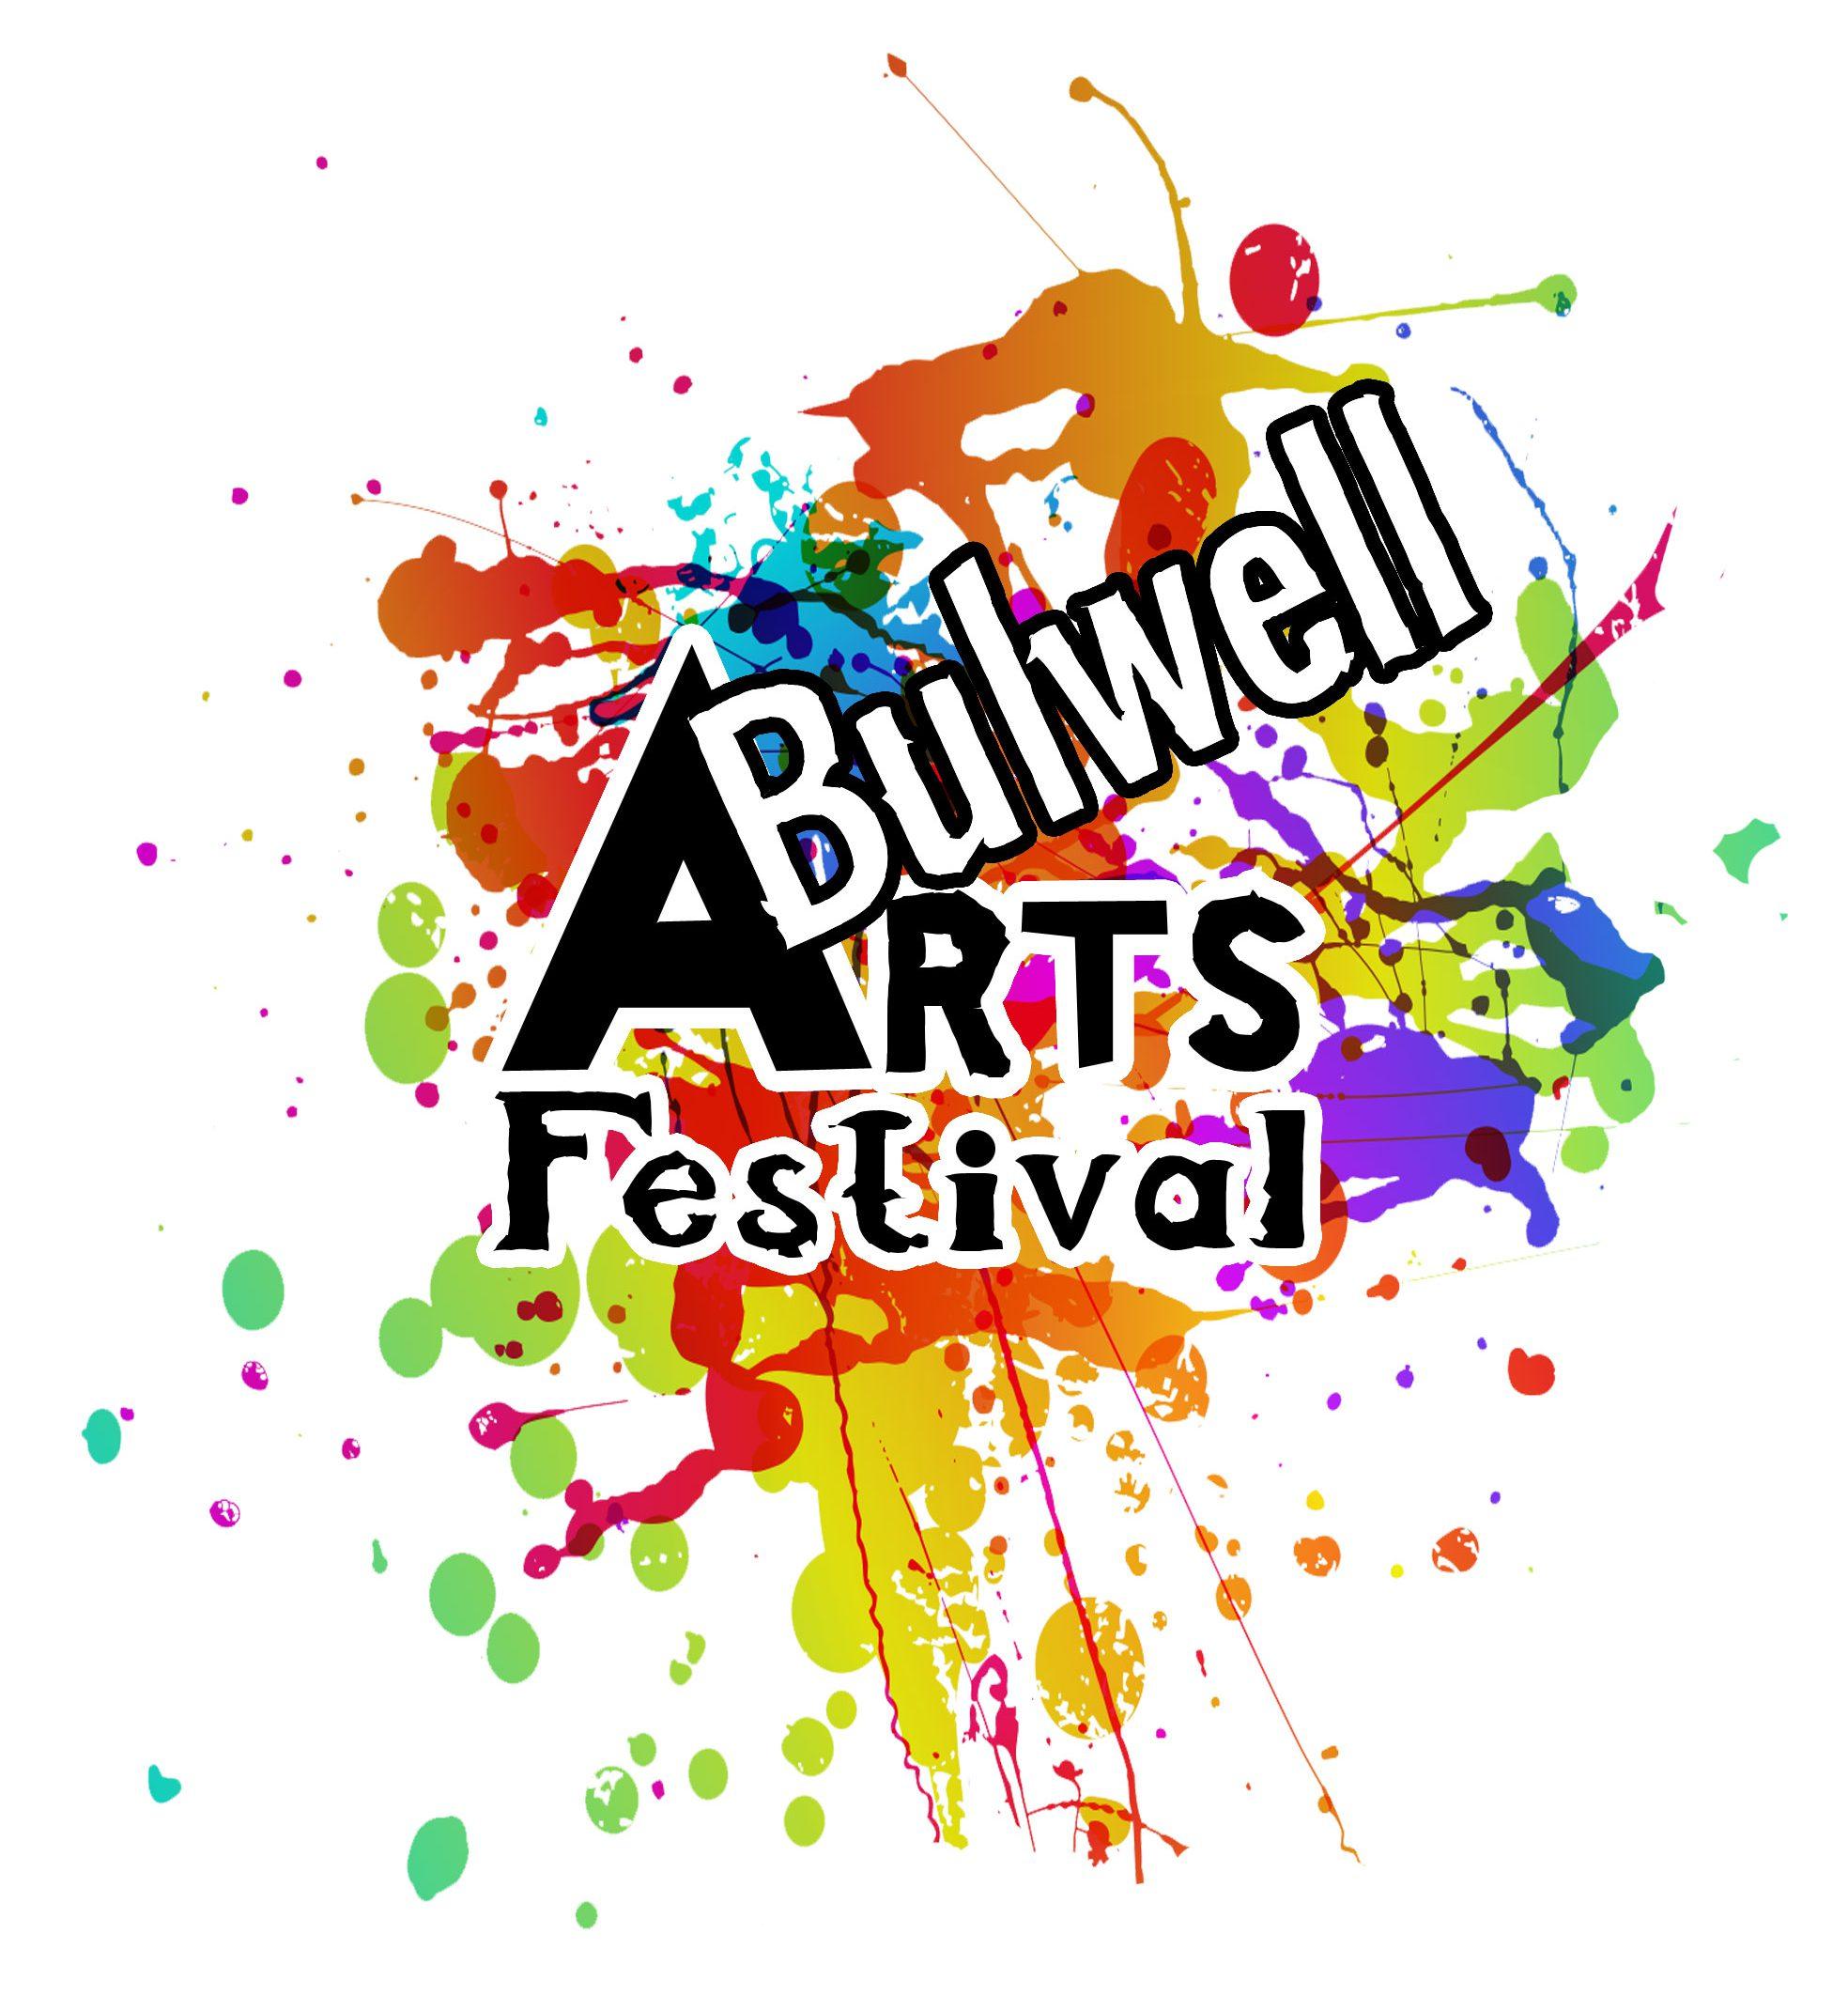 Bulwell Arts Festival 2018